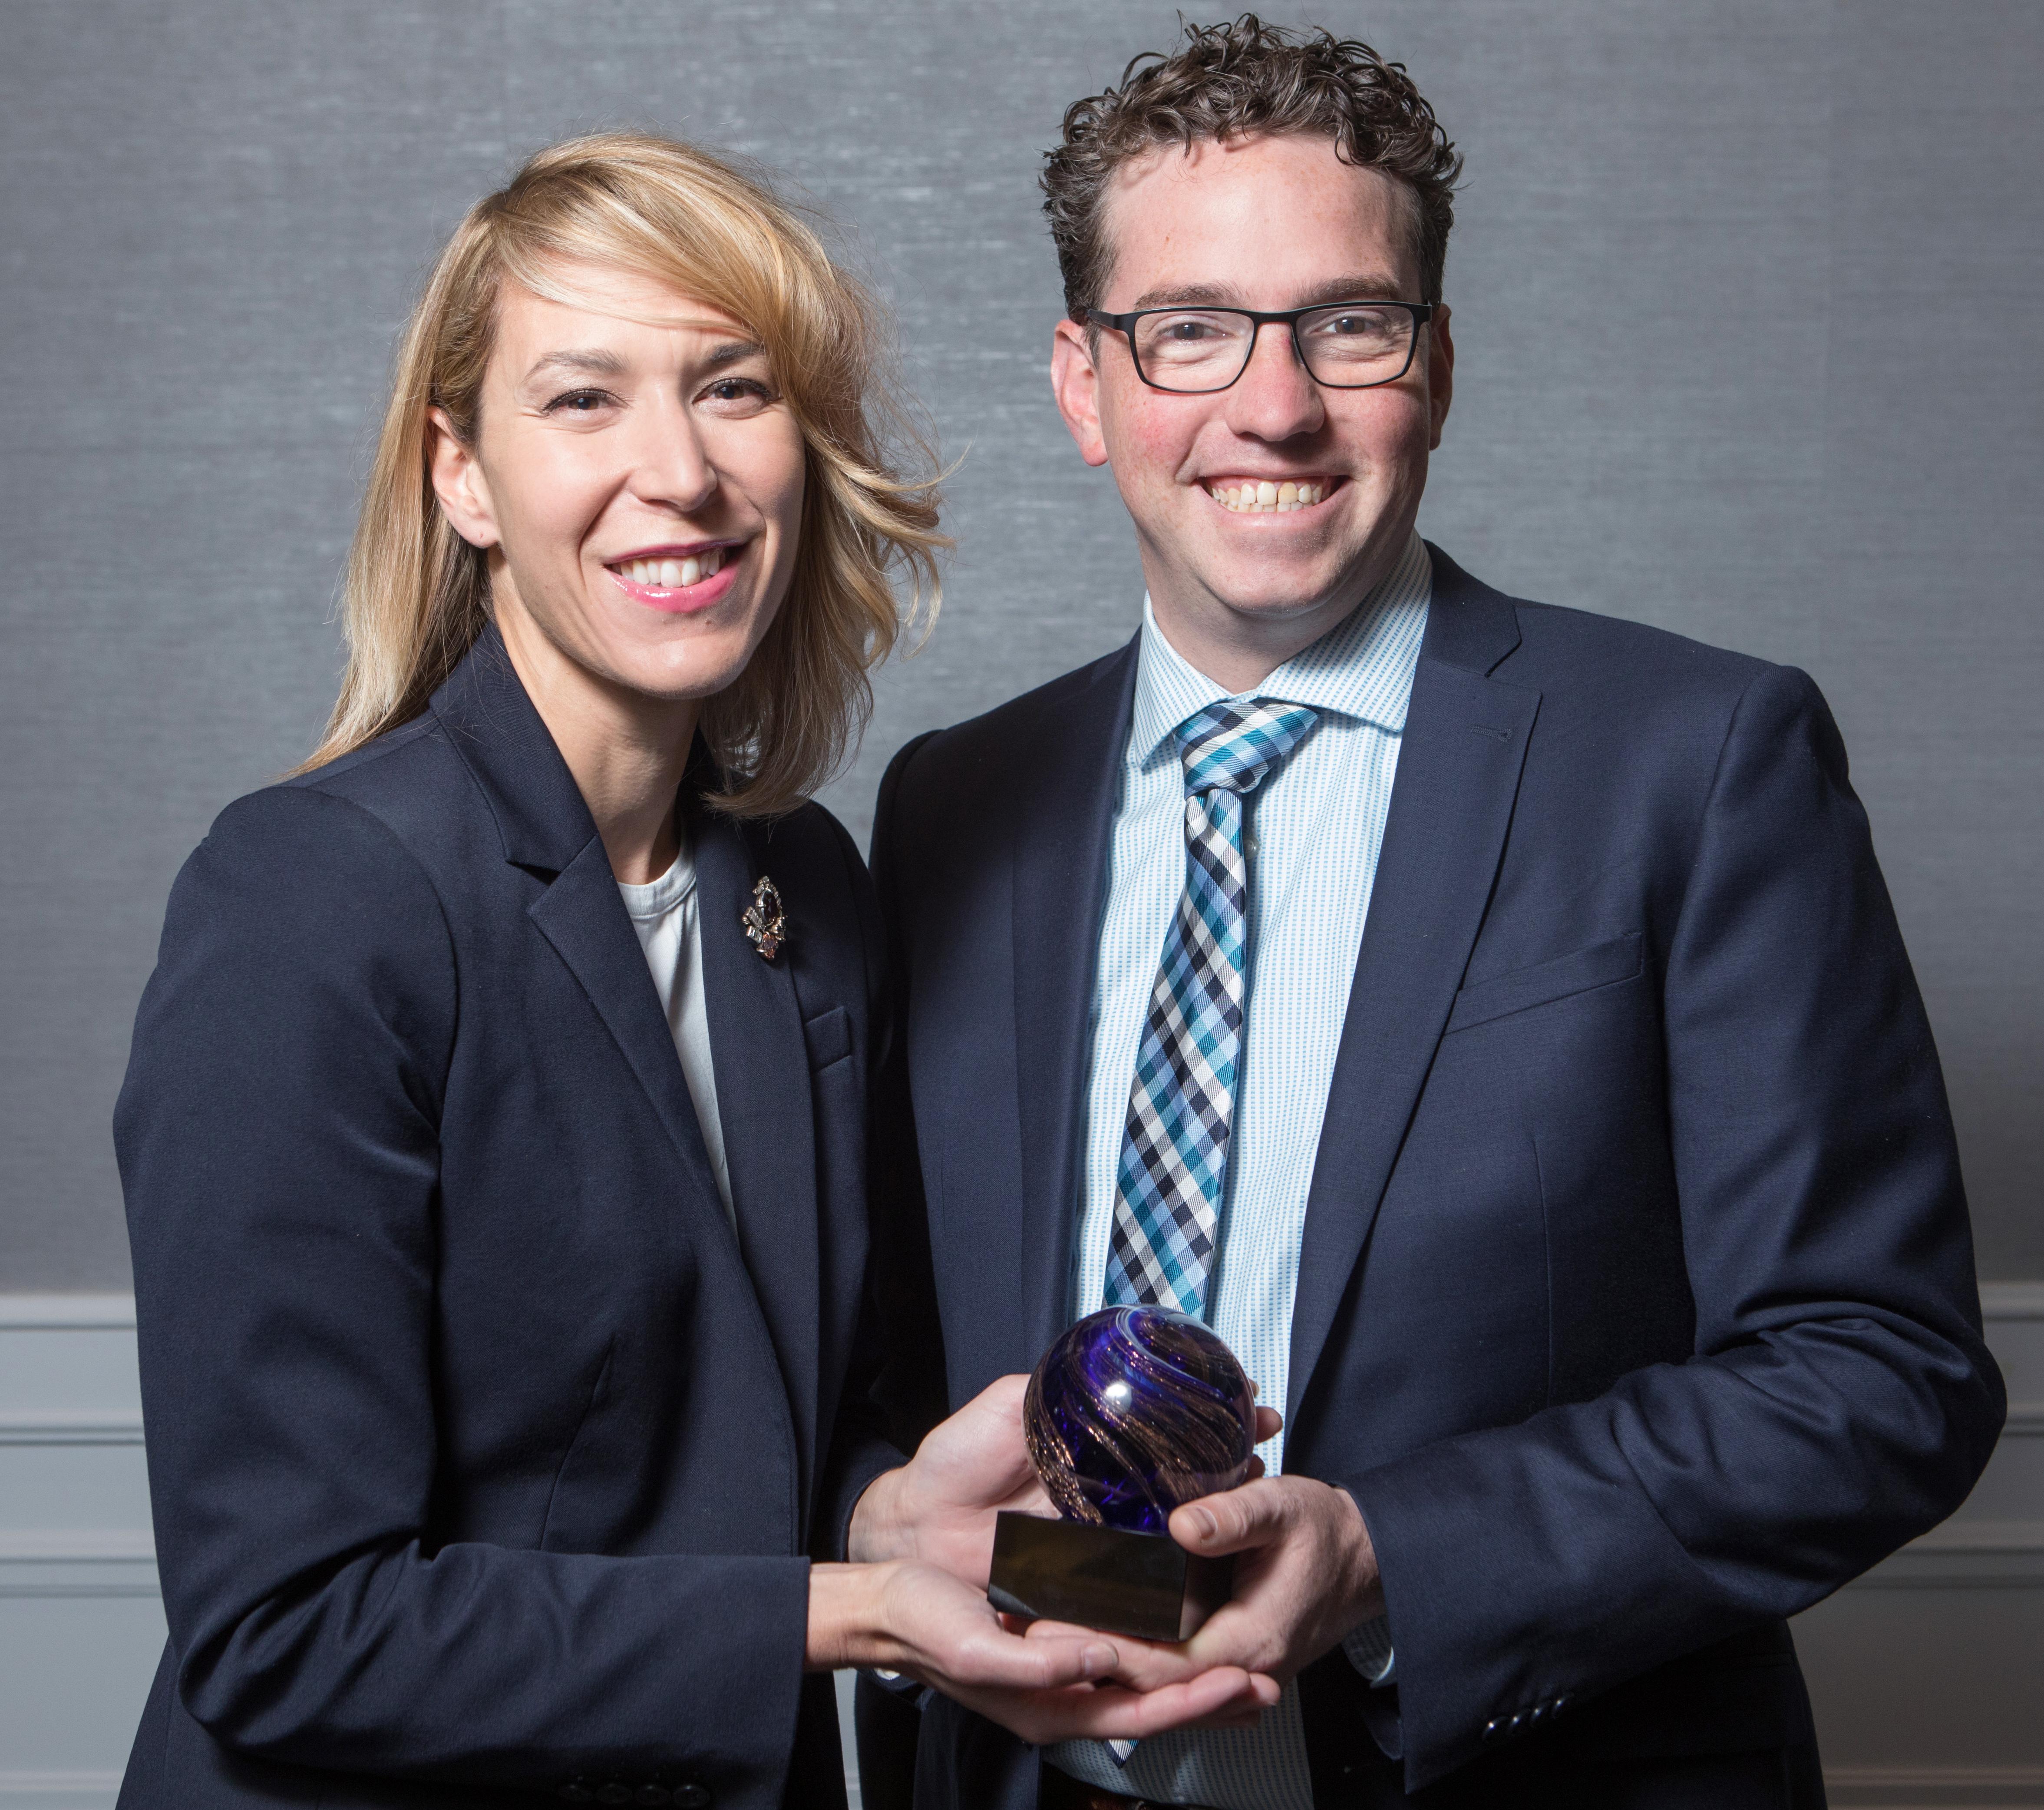 Neil McSheim, IAIABC NextGen Award Winner 2017